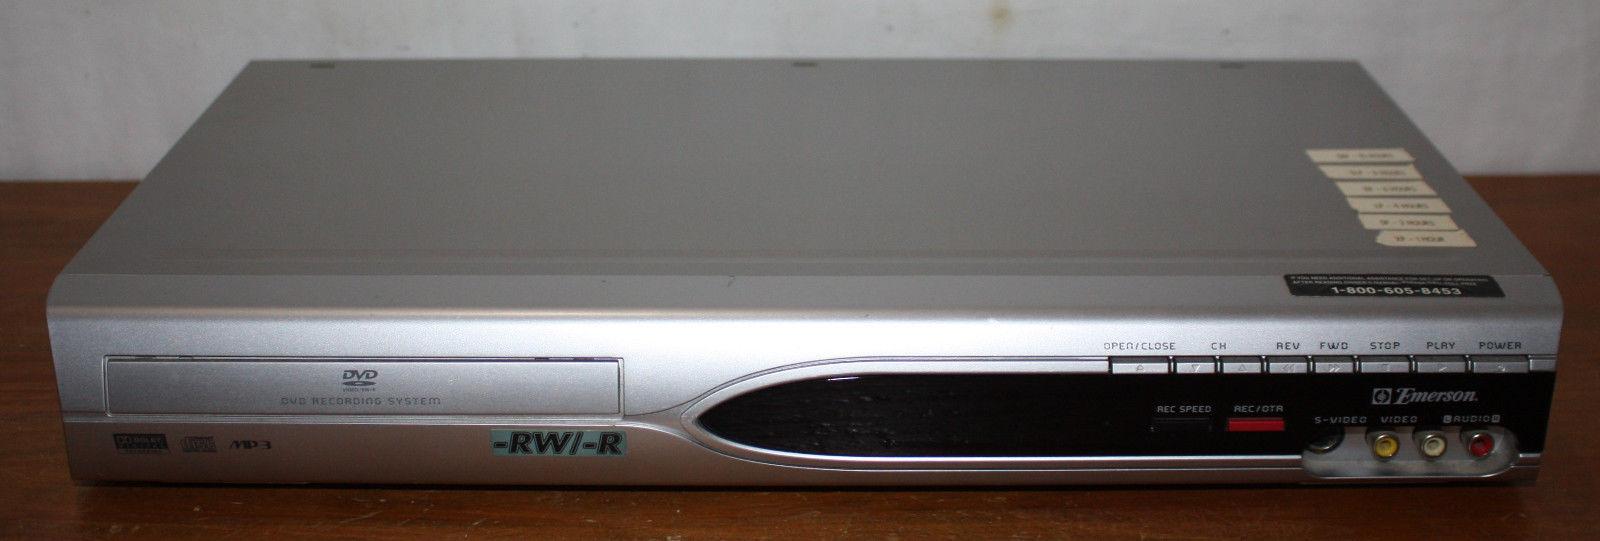 BROKEN - Emerson DVD Recorder & Player EWR10D5, DVD-RW DVD-R